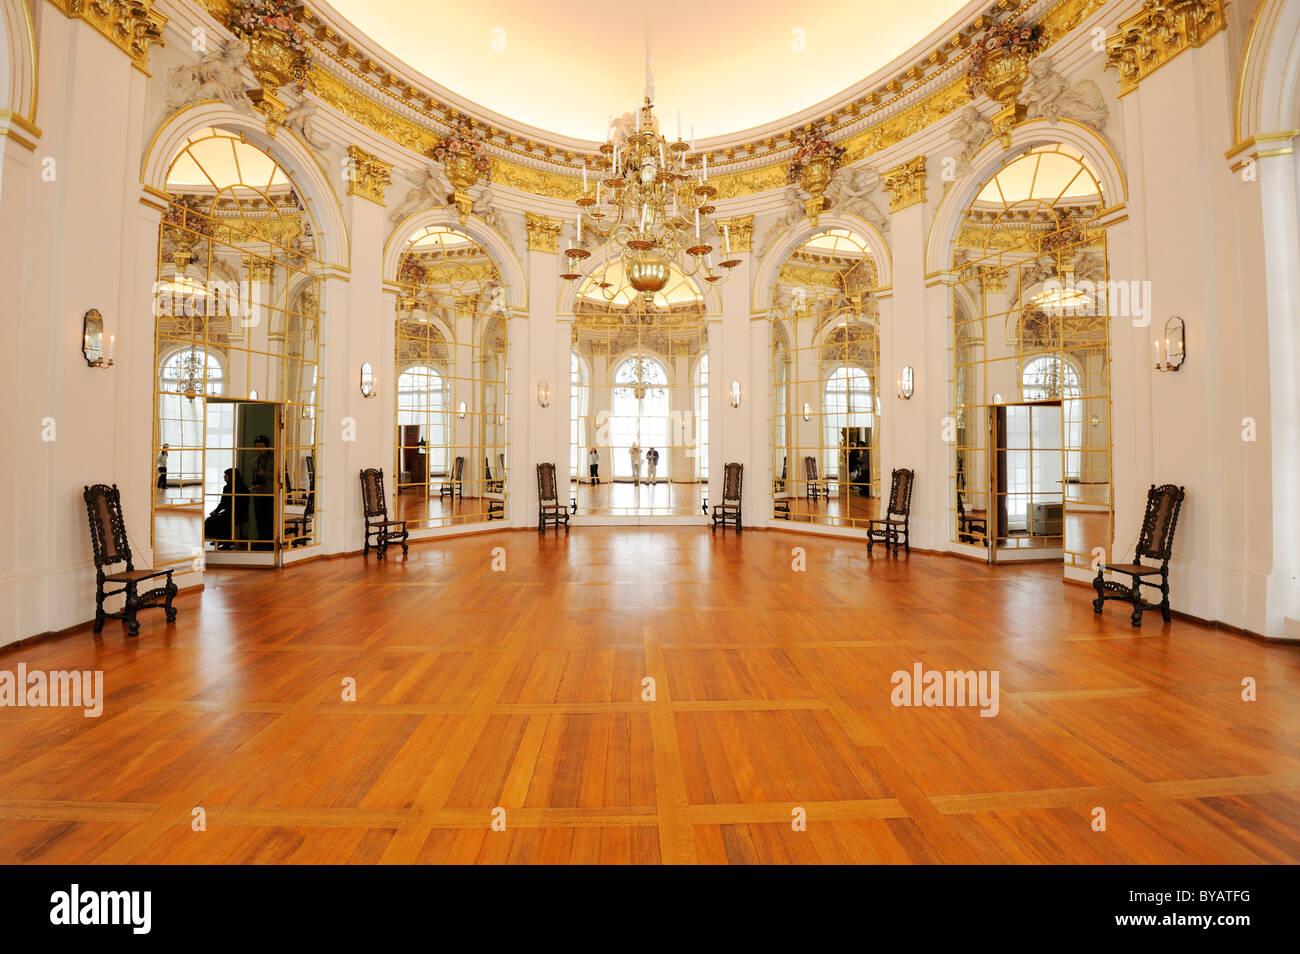 Oval Room In Schloss Charlottenburg Palace Berlin